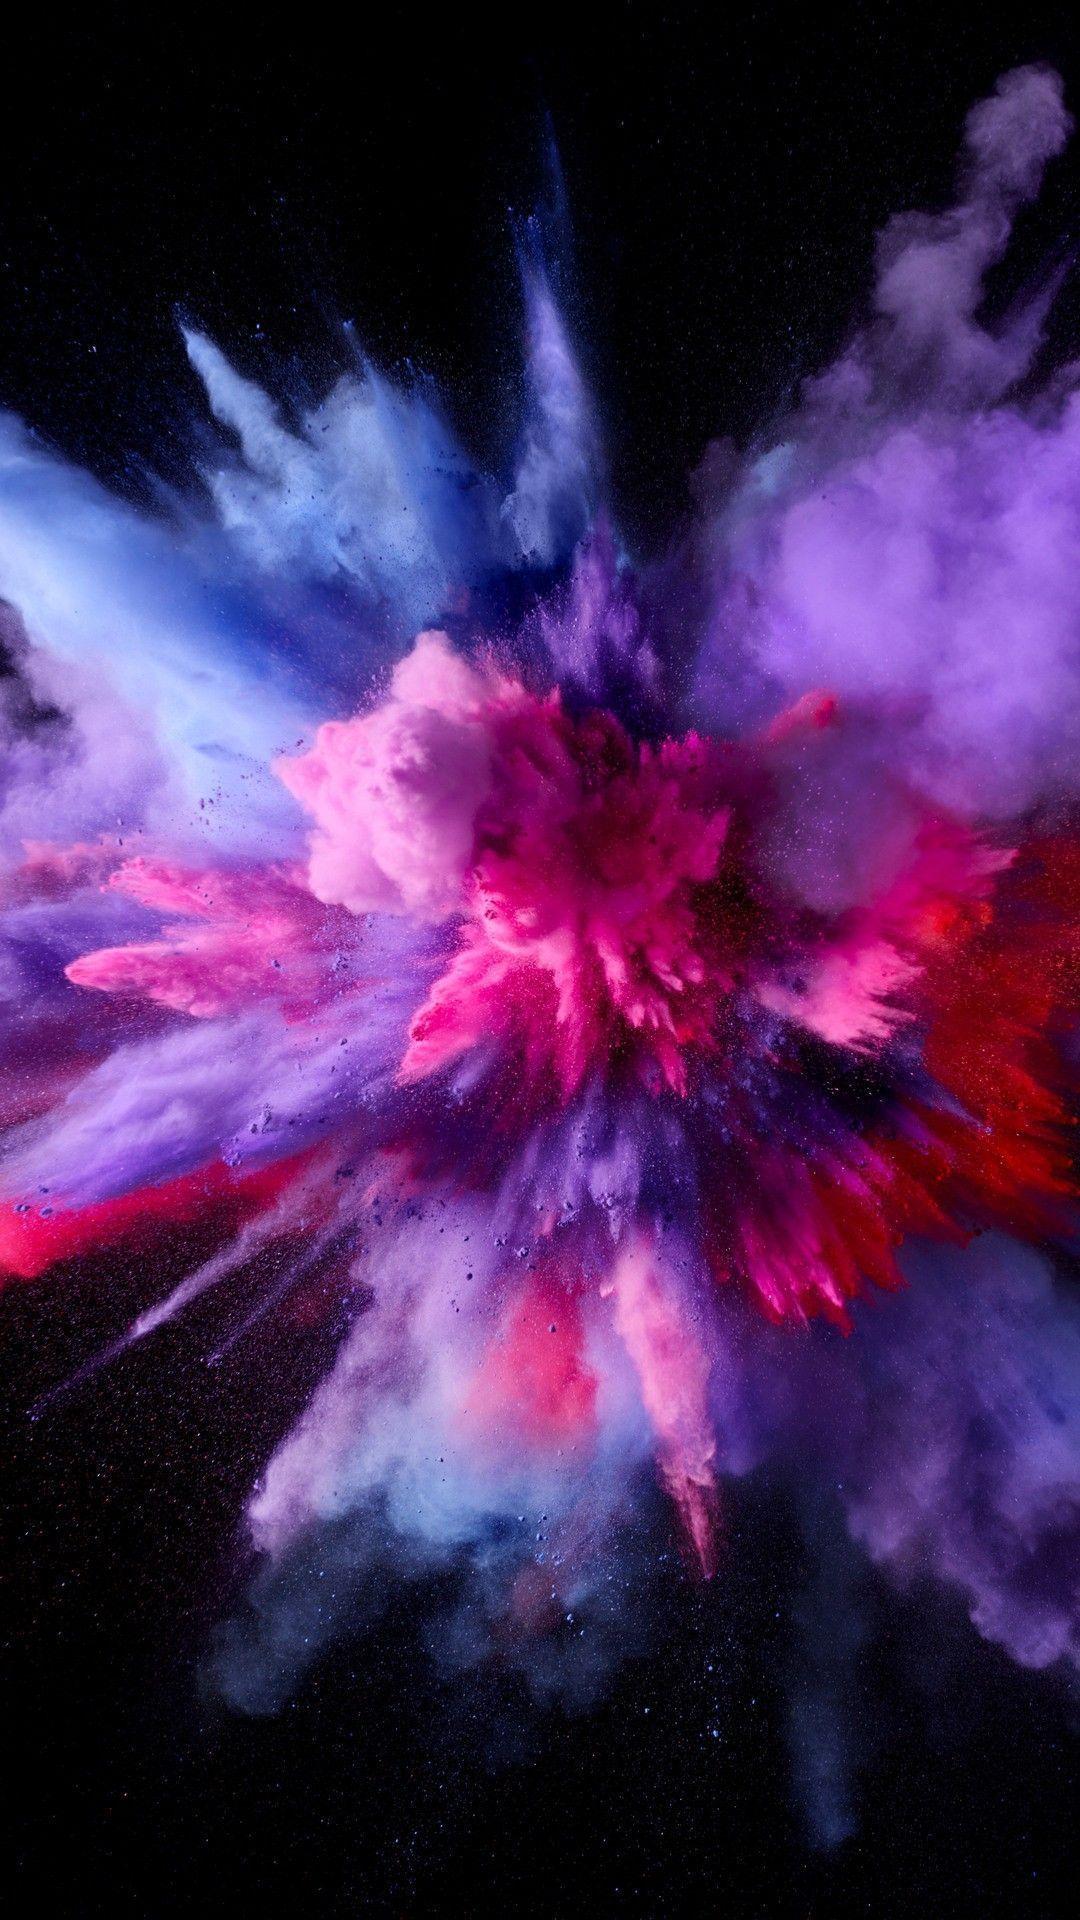 Hd Wallpaper 1080x1920 Iphone Hd Wallpaper Smoke Wallpaper Beautiful Wallpapers Colorful Wallpaper